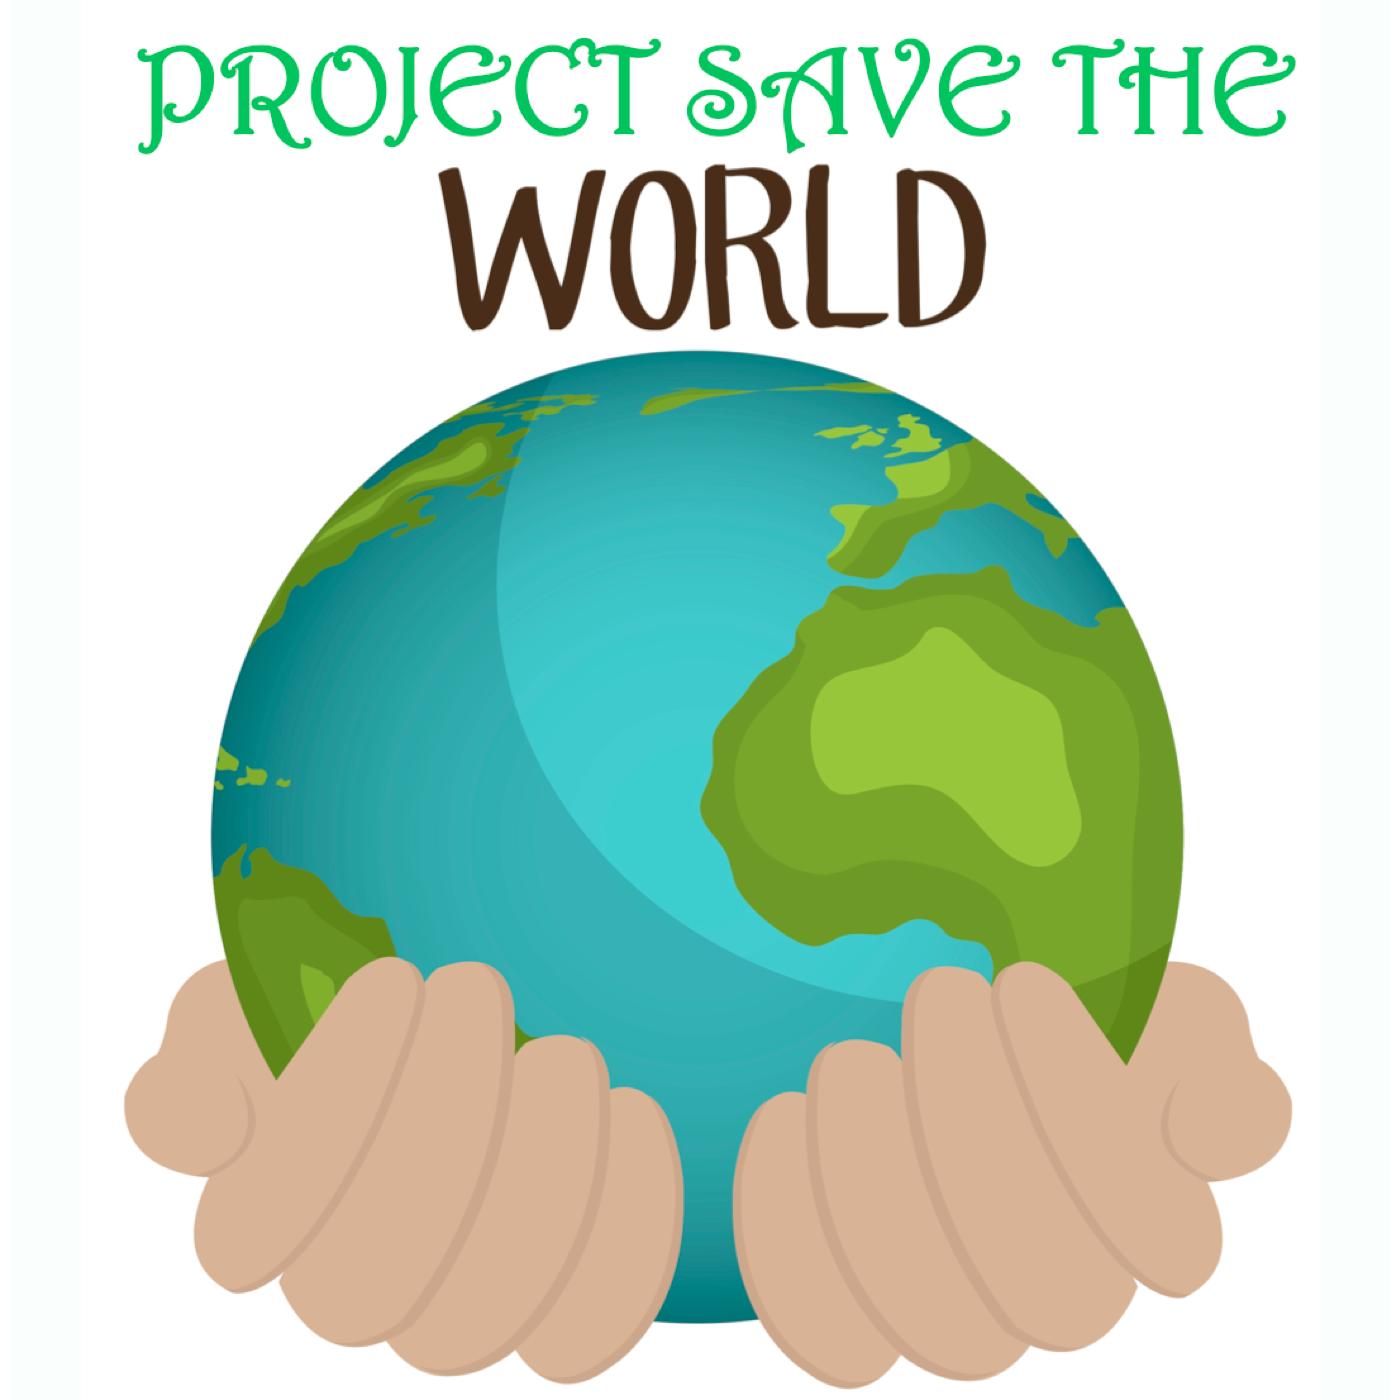 projectsavetheworld's podcast show art